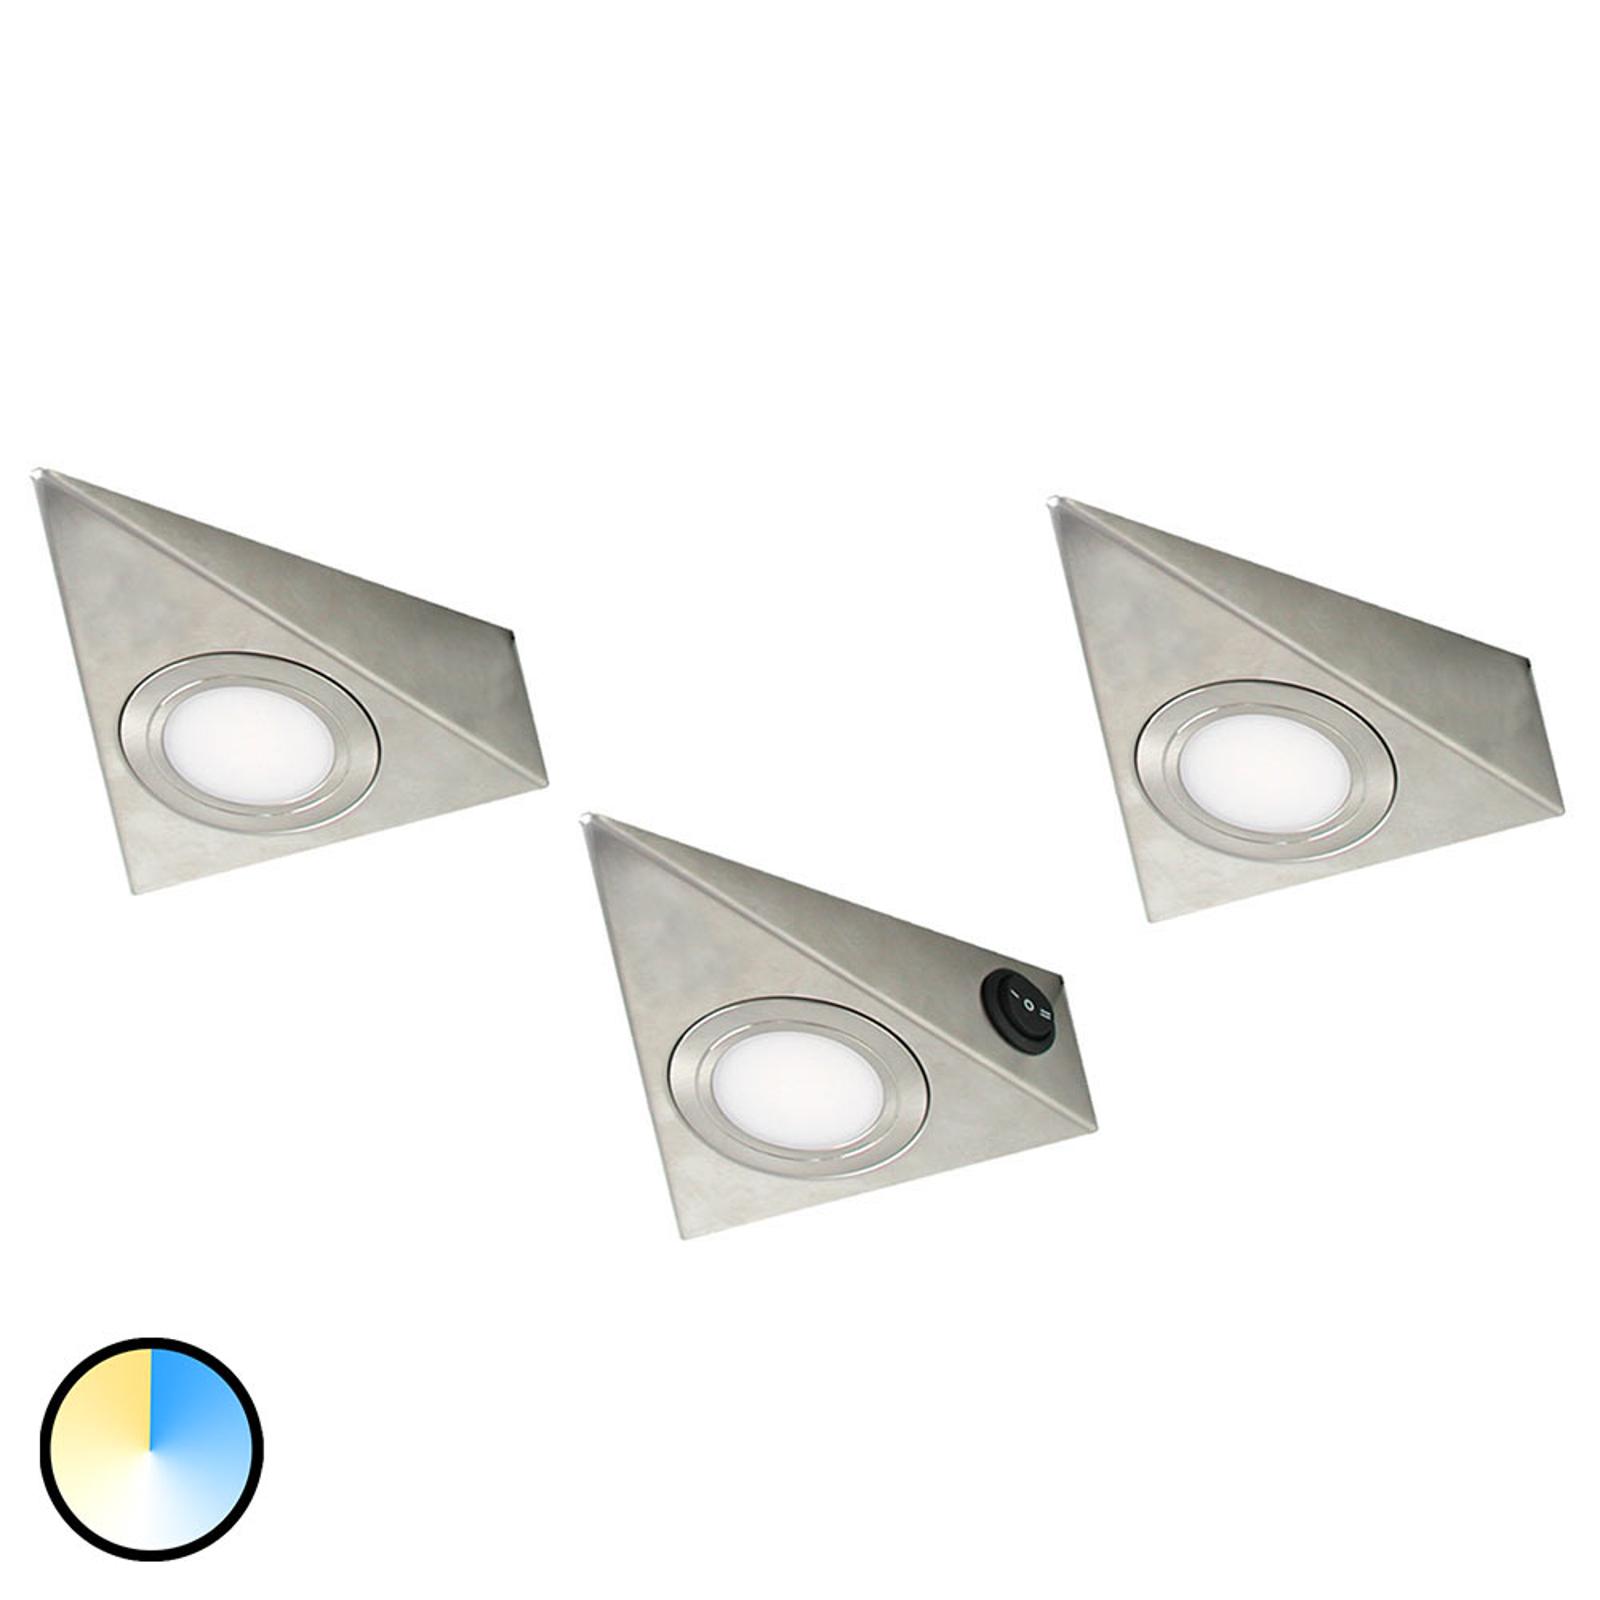 CS LED-underskabsbelysning, trekantet, sæt med 3